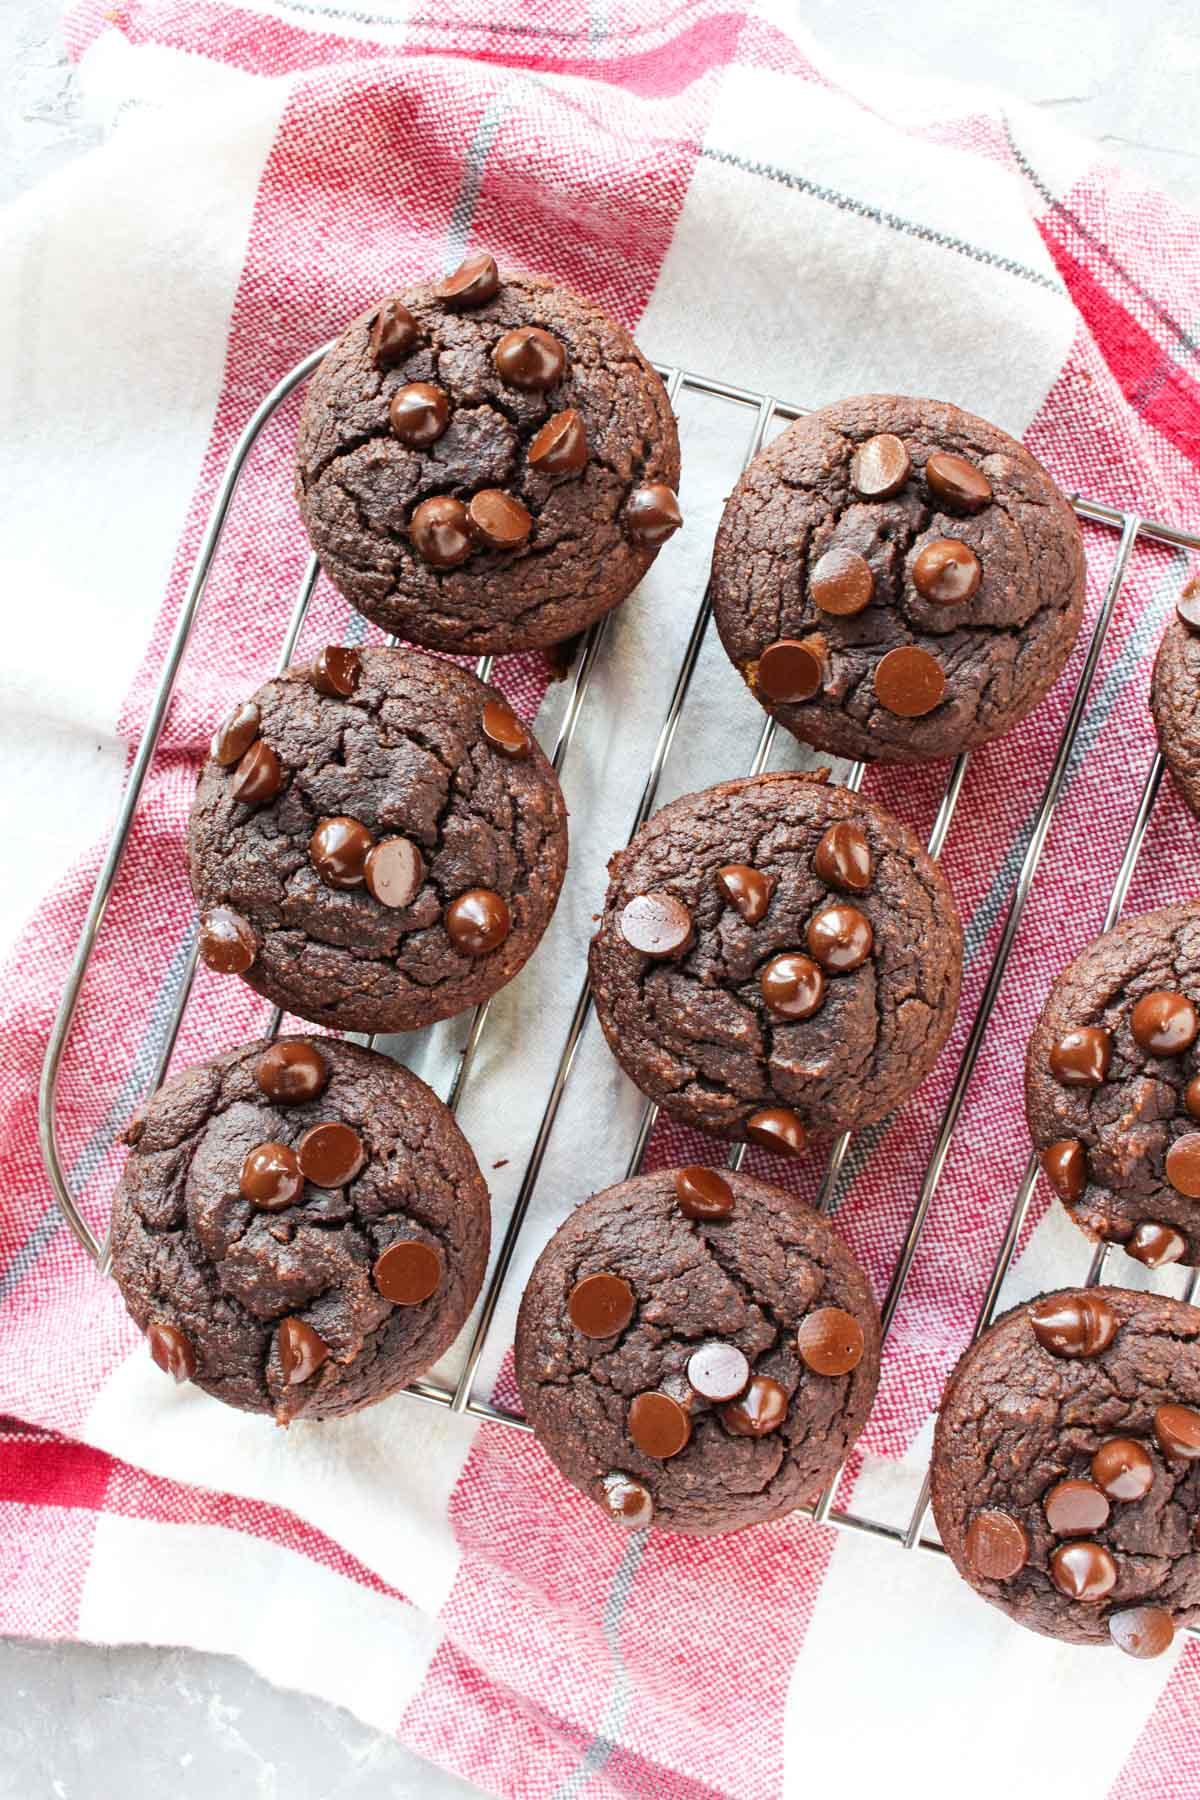 chocolate banana muffins cooling on metal rack.